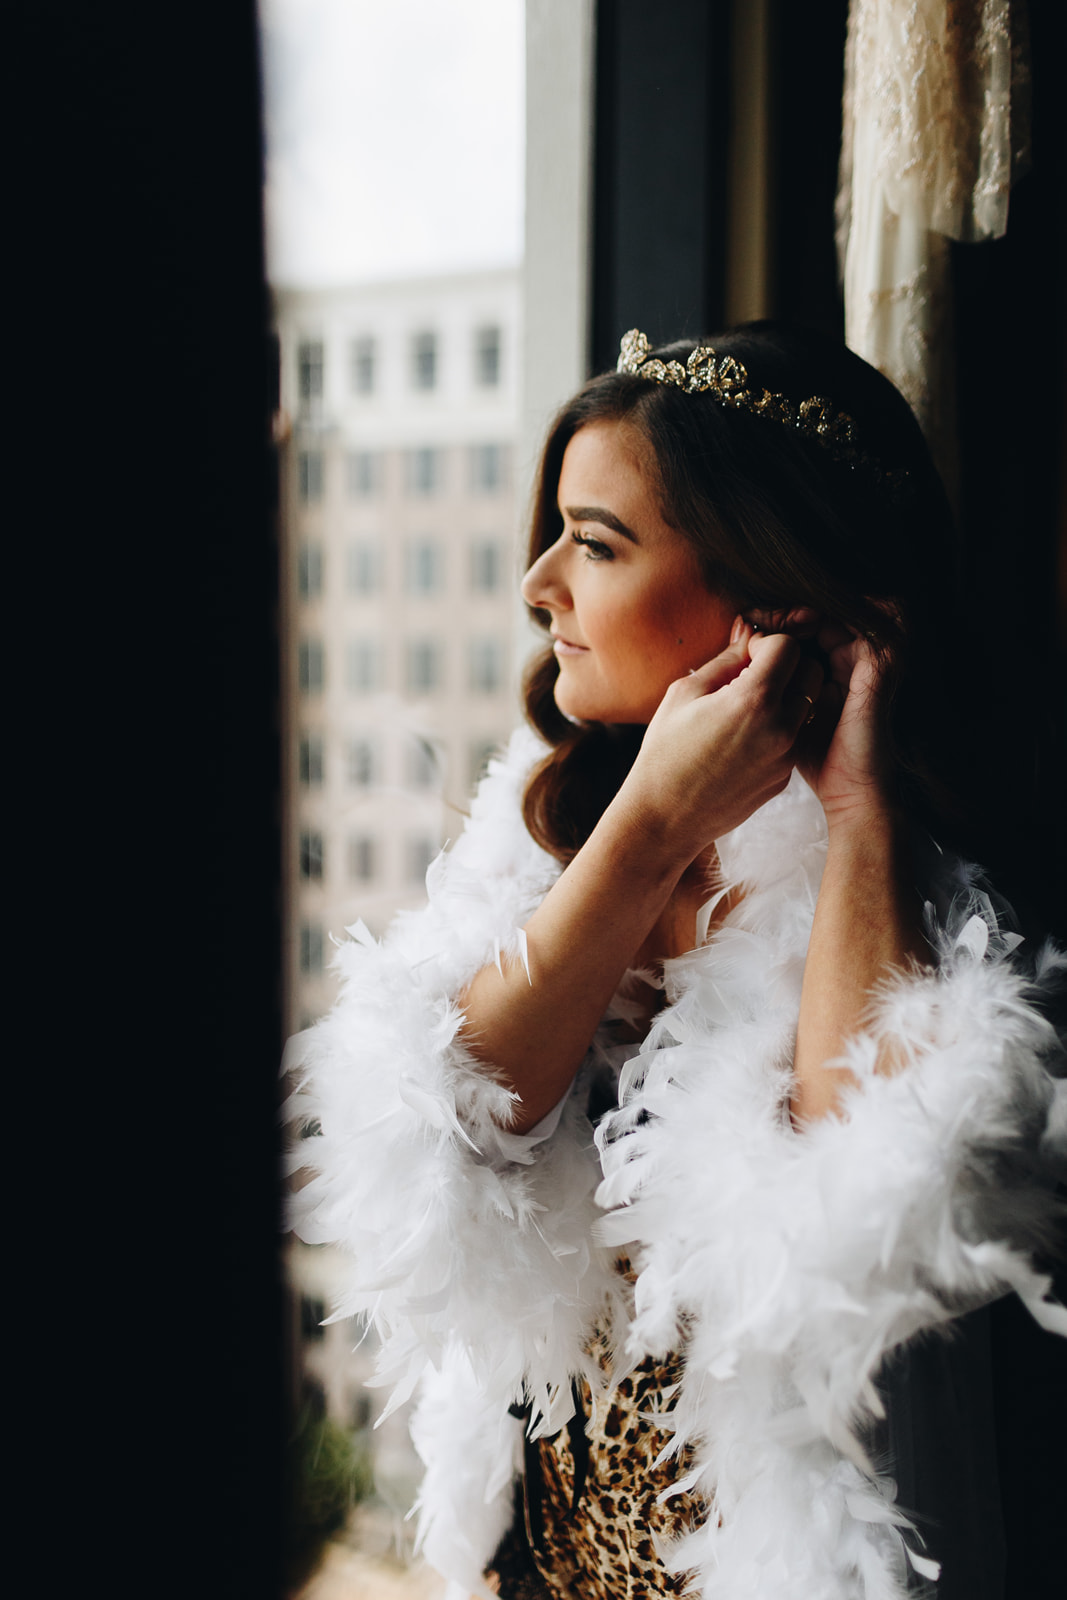 Maria Elena headpieces gold crown